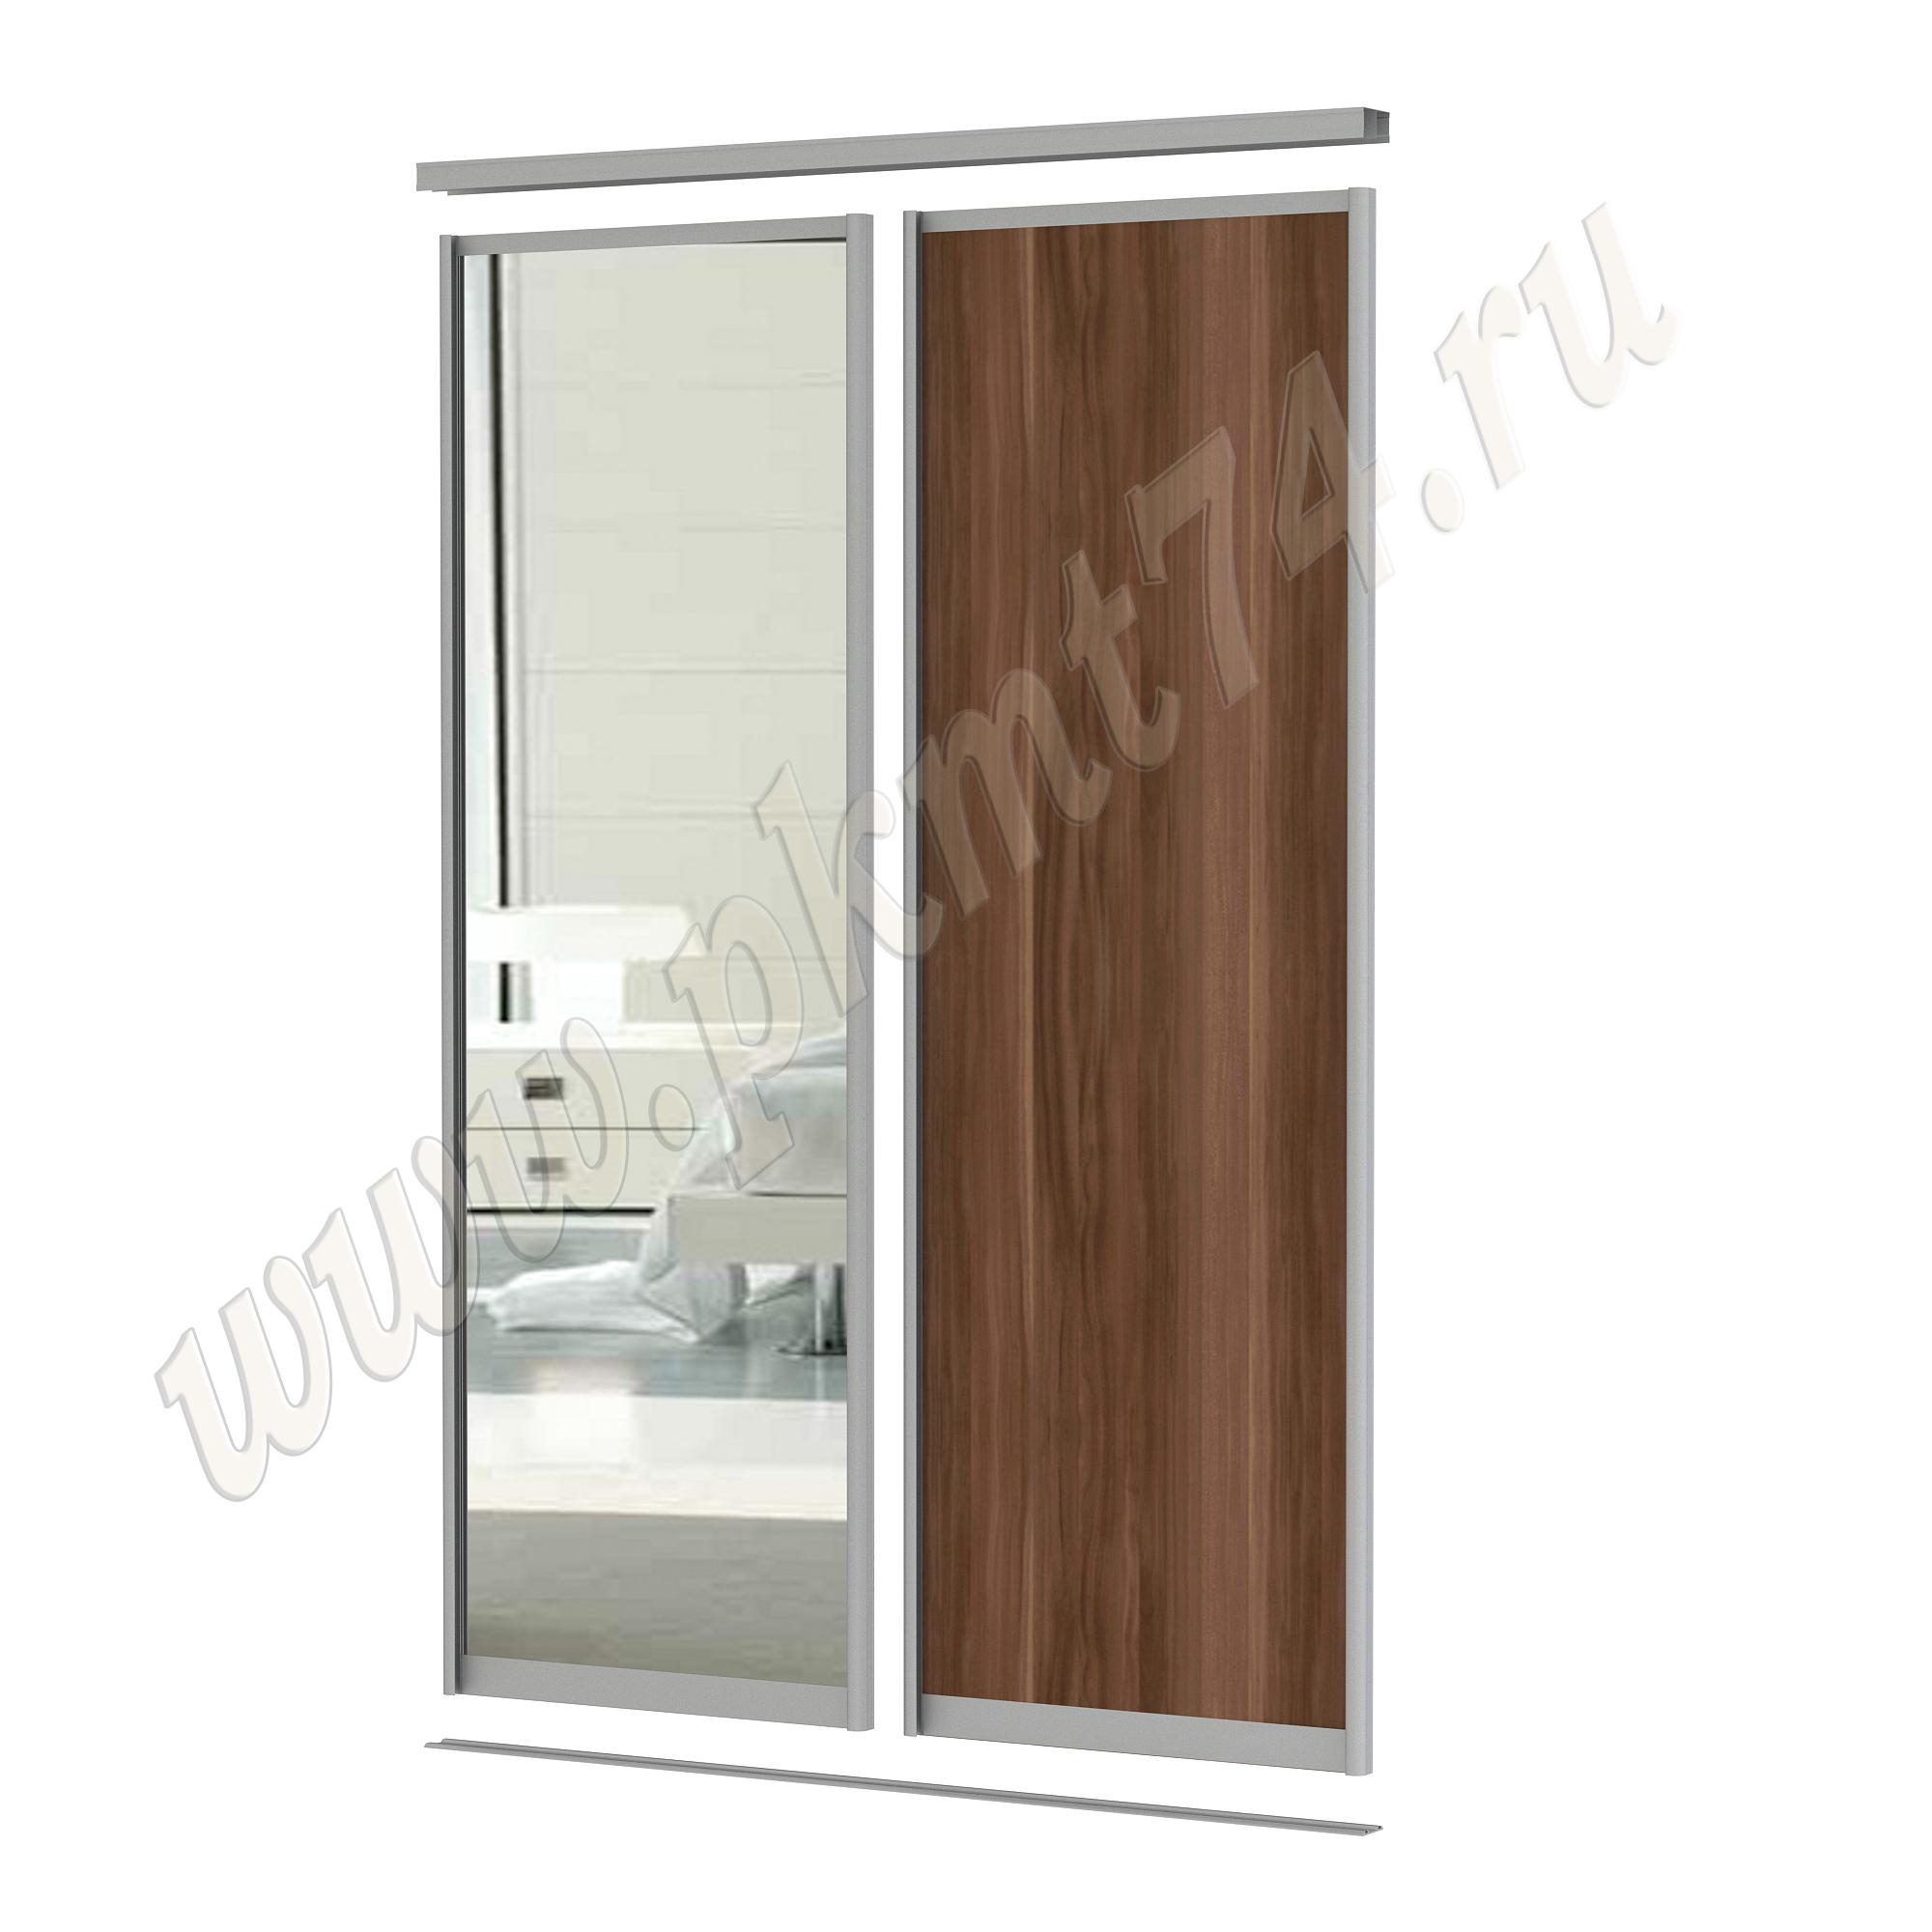 Комбинированные двери для шкафа купе [Размер:: 1700х2500; Цвет ЛДСП:: Слива Валлис]